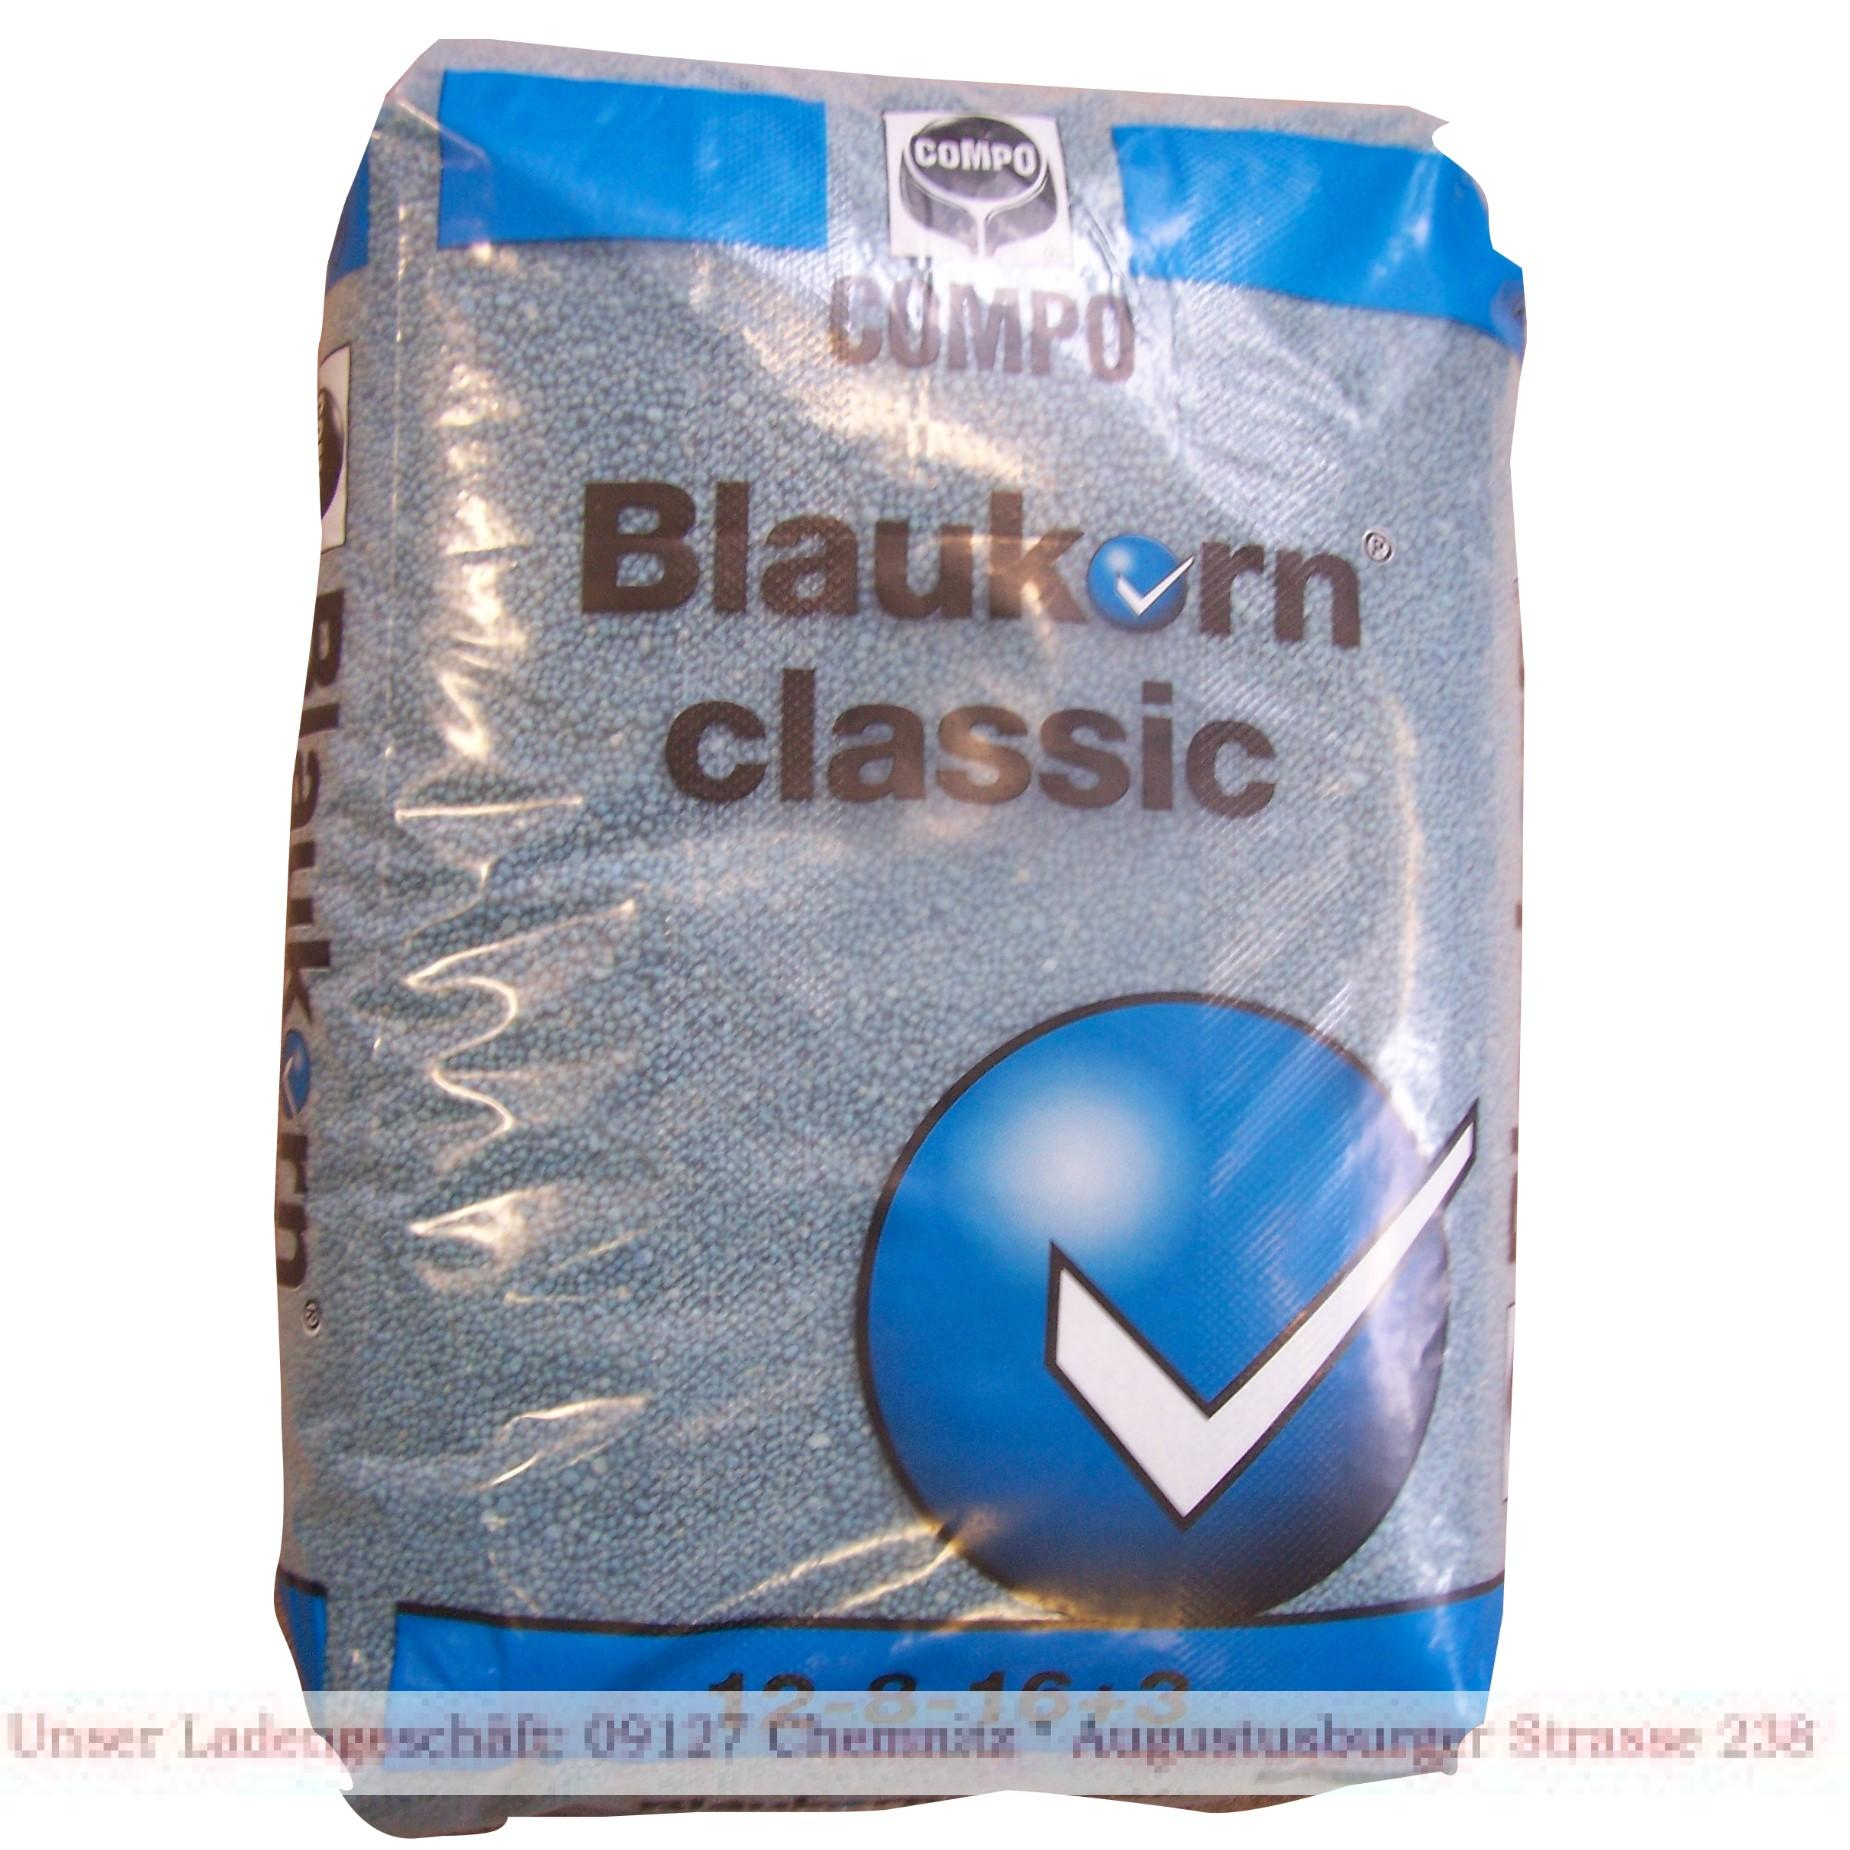 blaukorn 25 kilo combo npk mgo 12 8 16 10 stickstoff. Black Bedroom Furniture Sets. Home Design Ideas